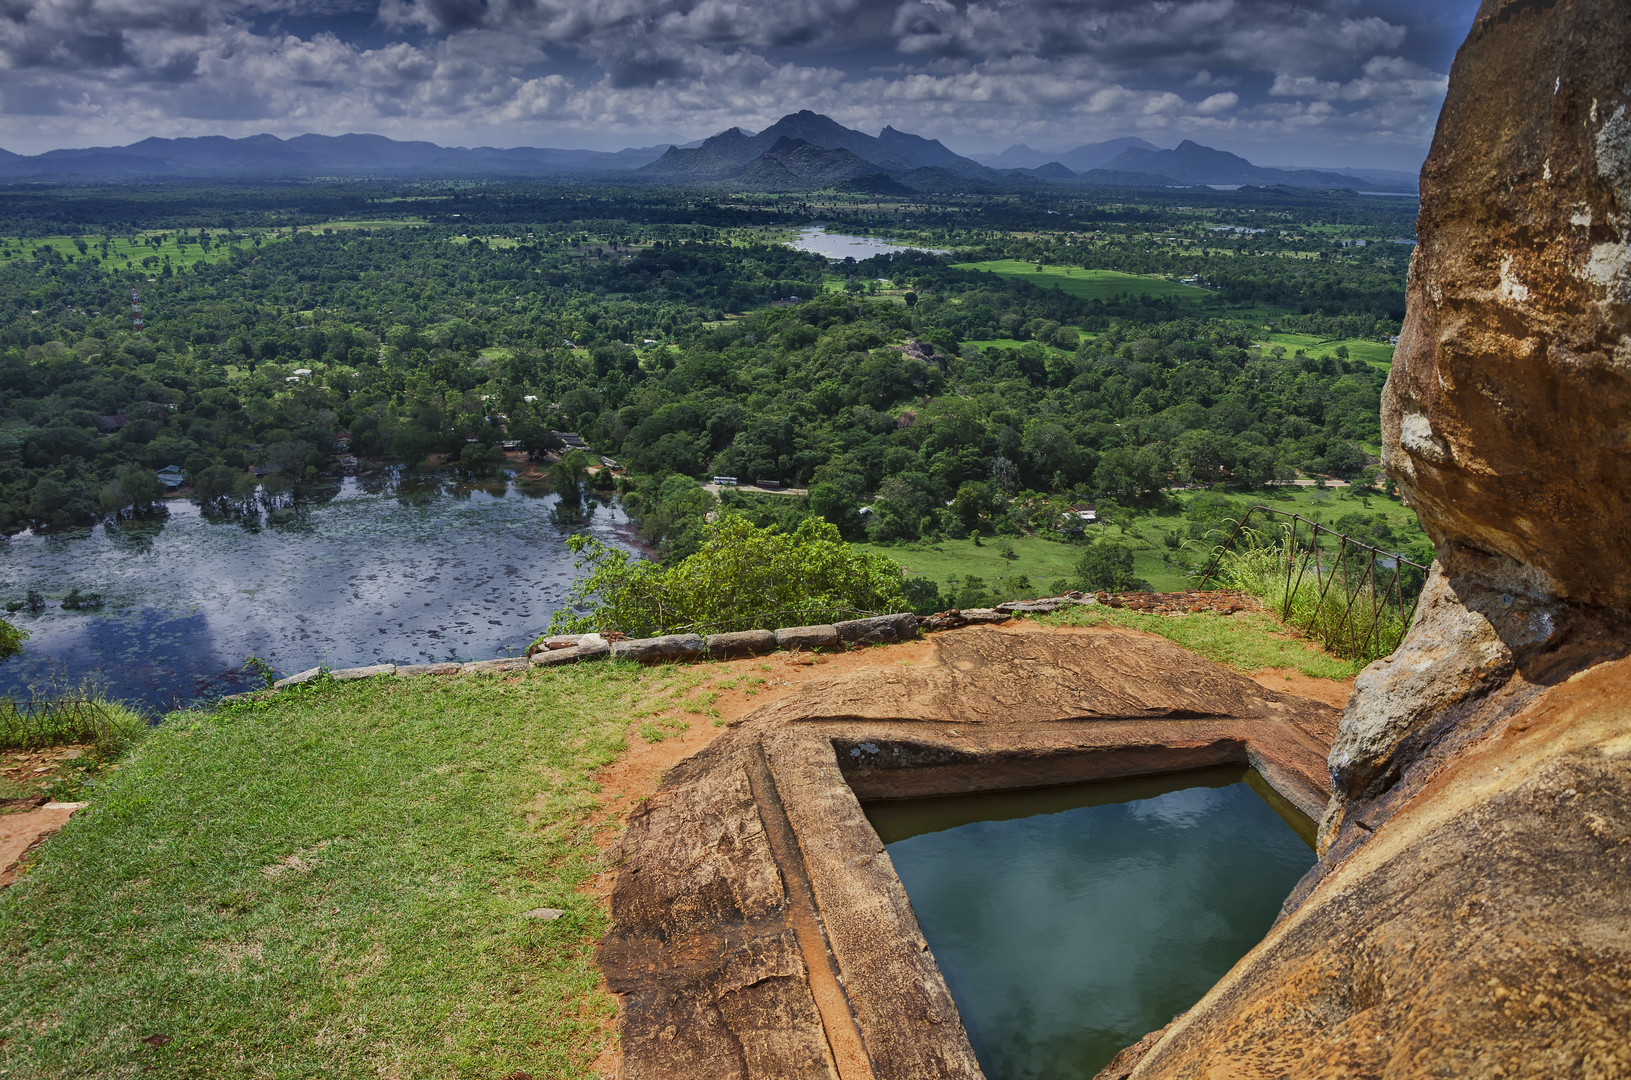 Sigiriya - view from the top